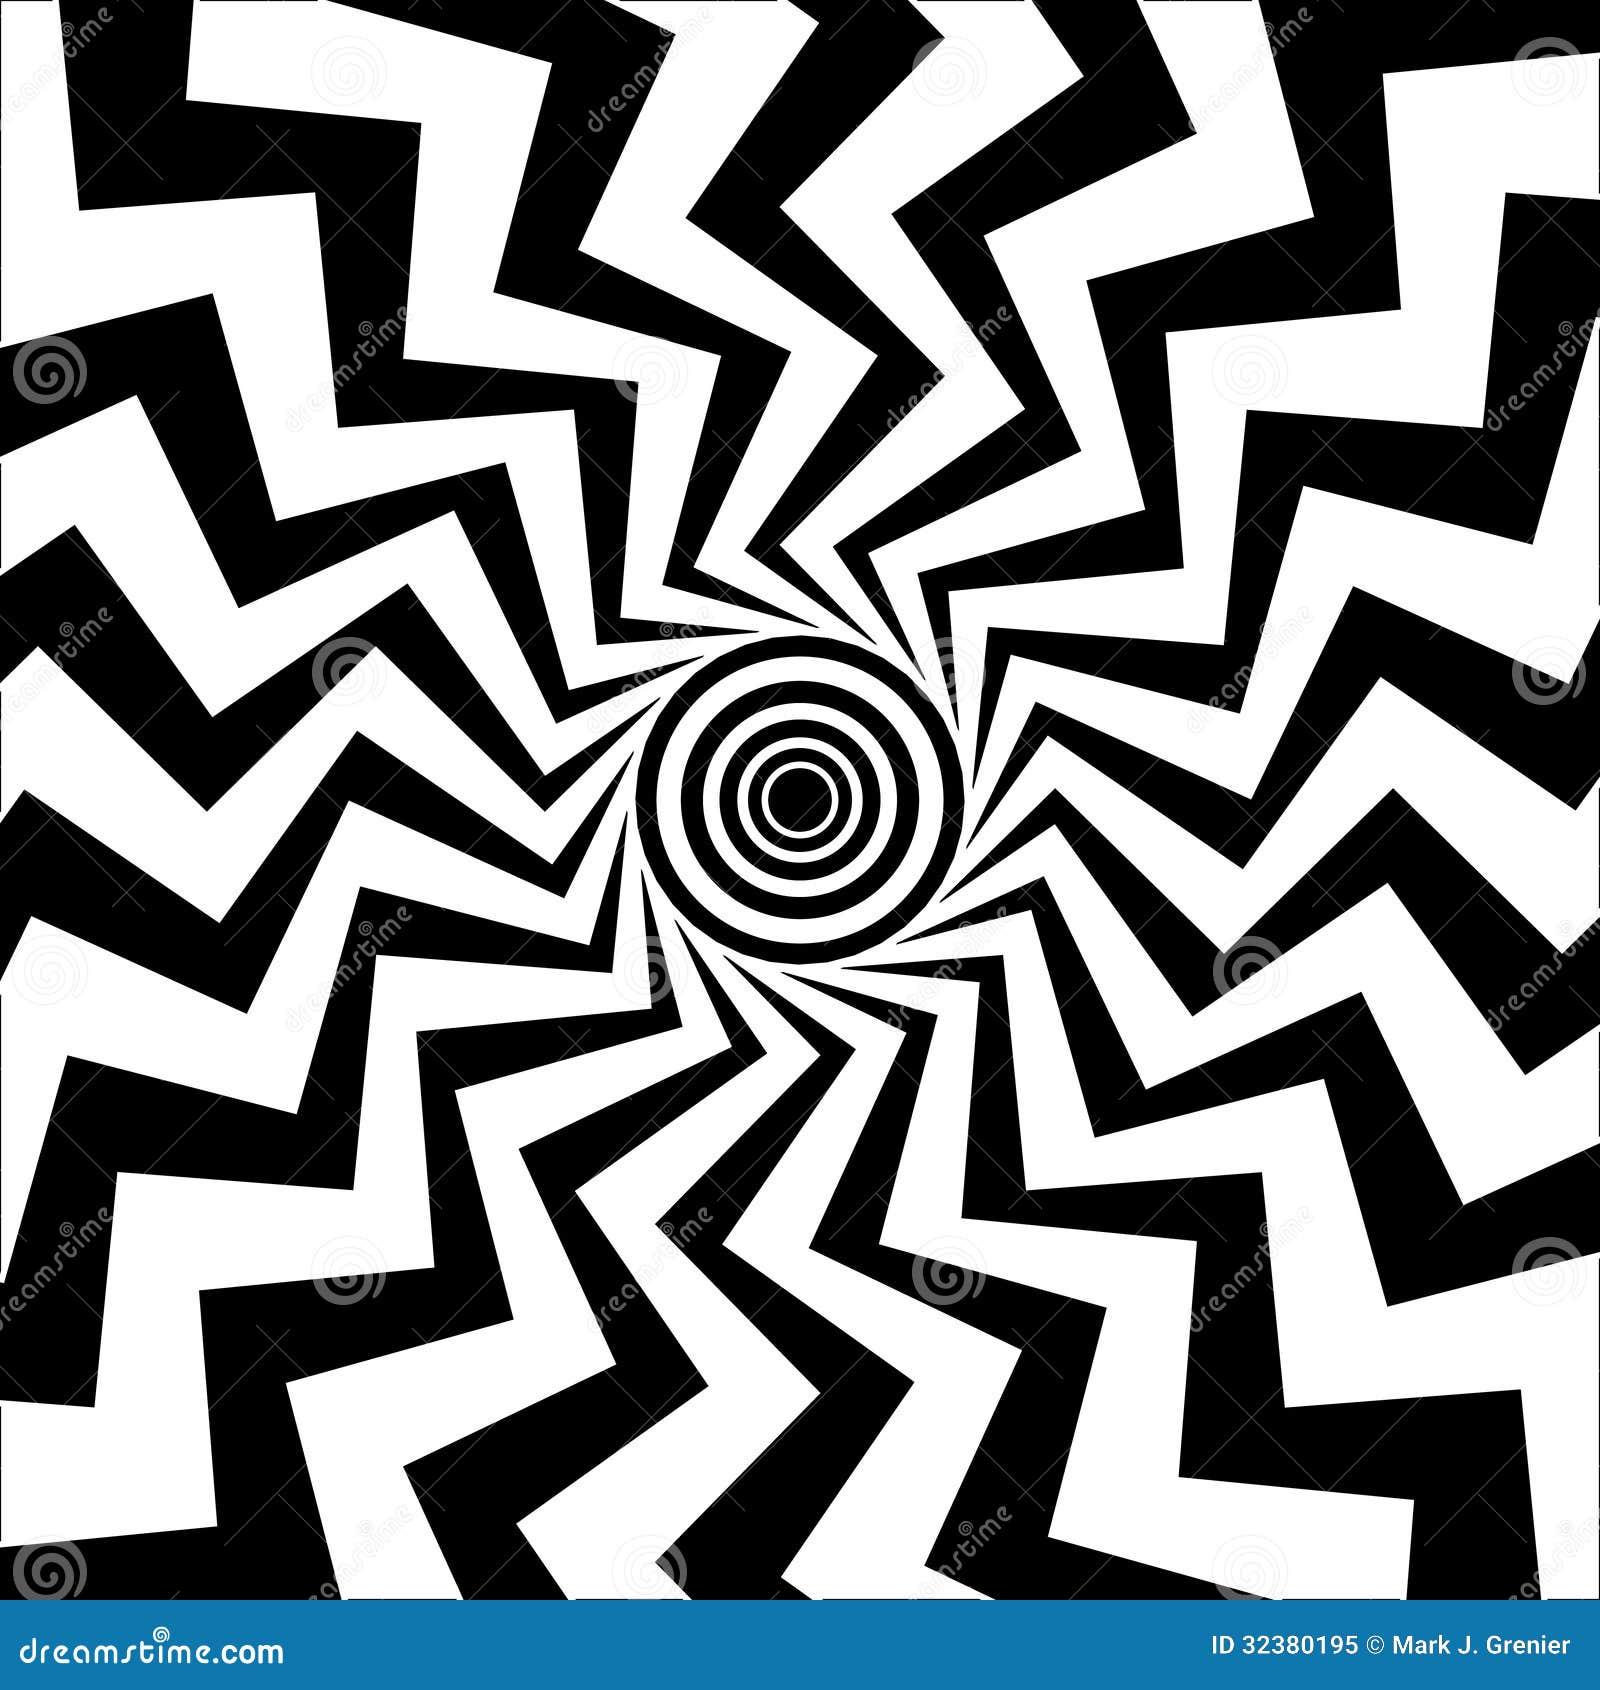 zigzag bull 39 s eye royalty free stock photo image 32380195. Black Bedroom Furniture Sets. Home Design Ideas